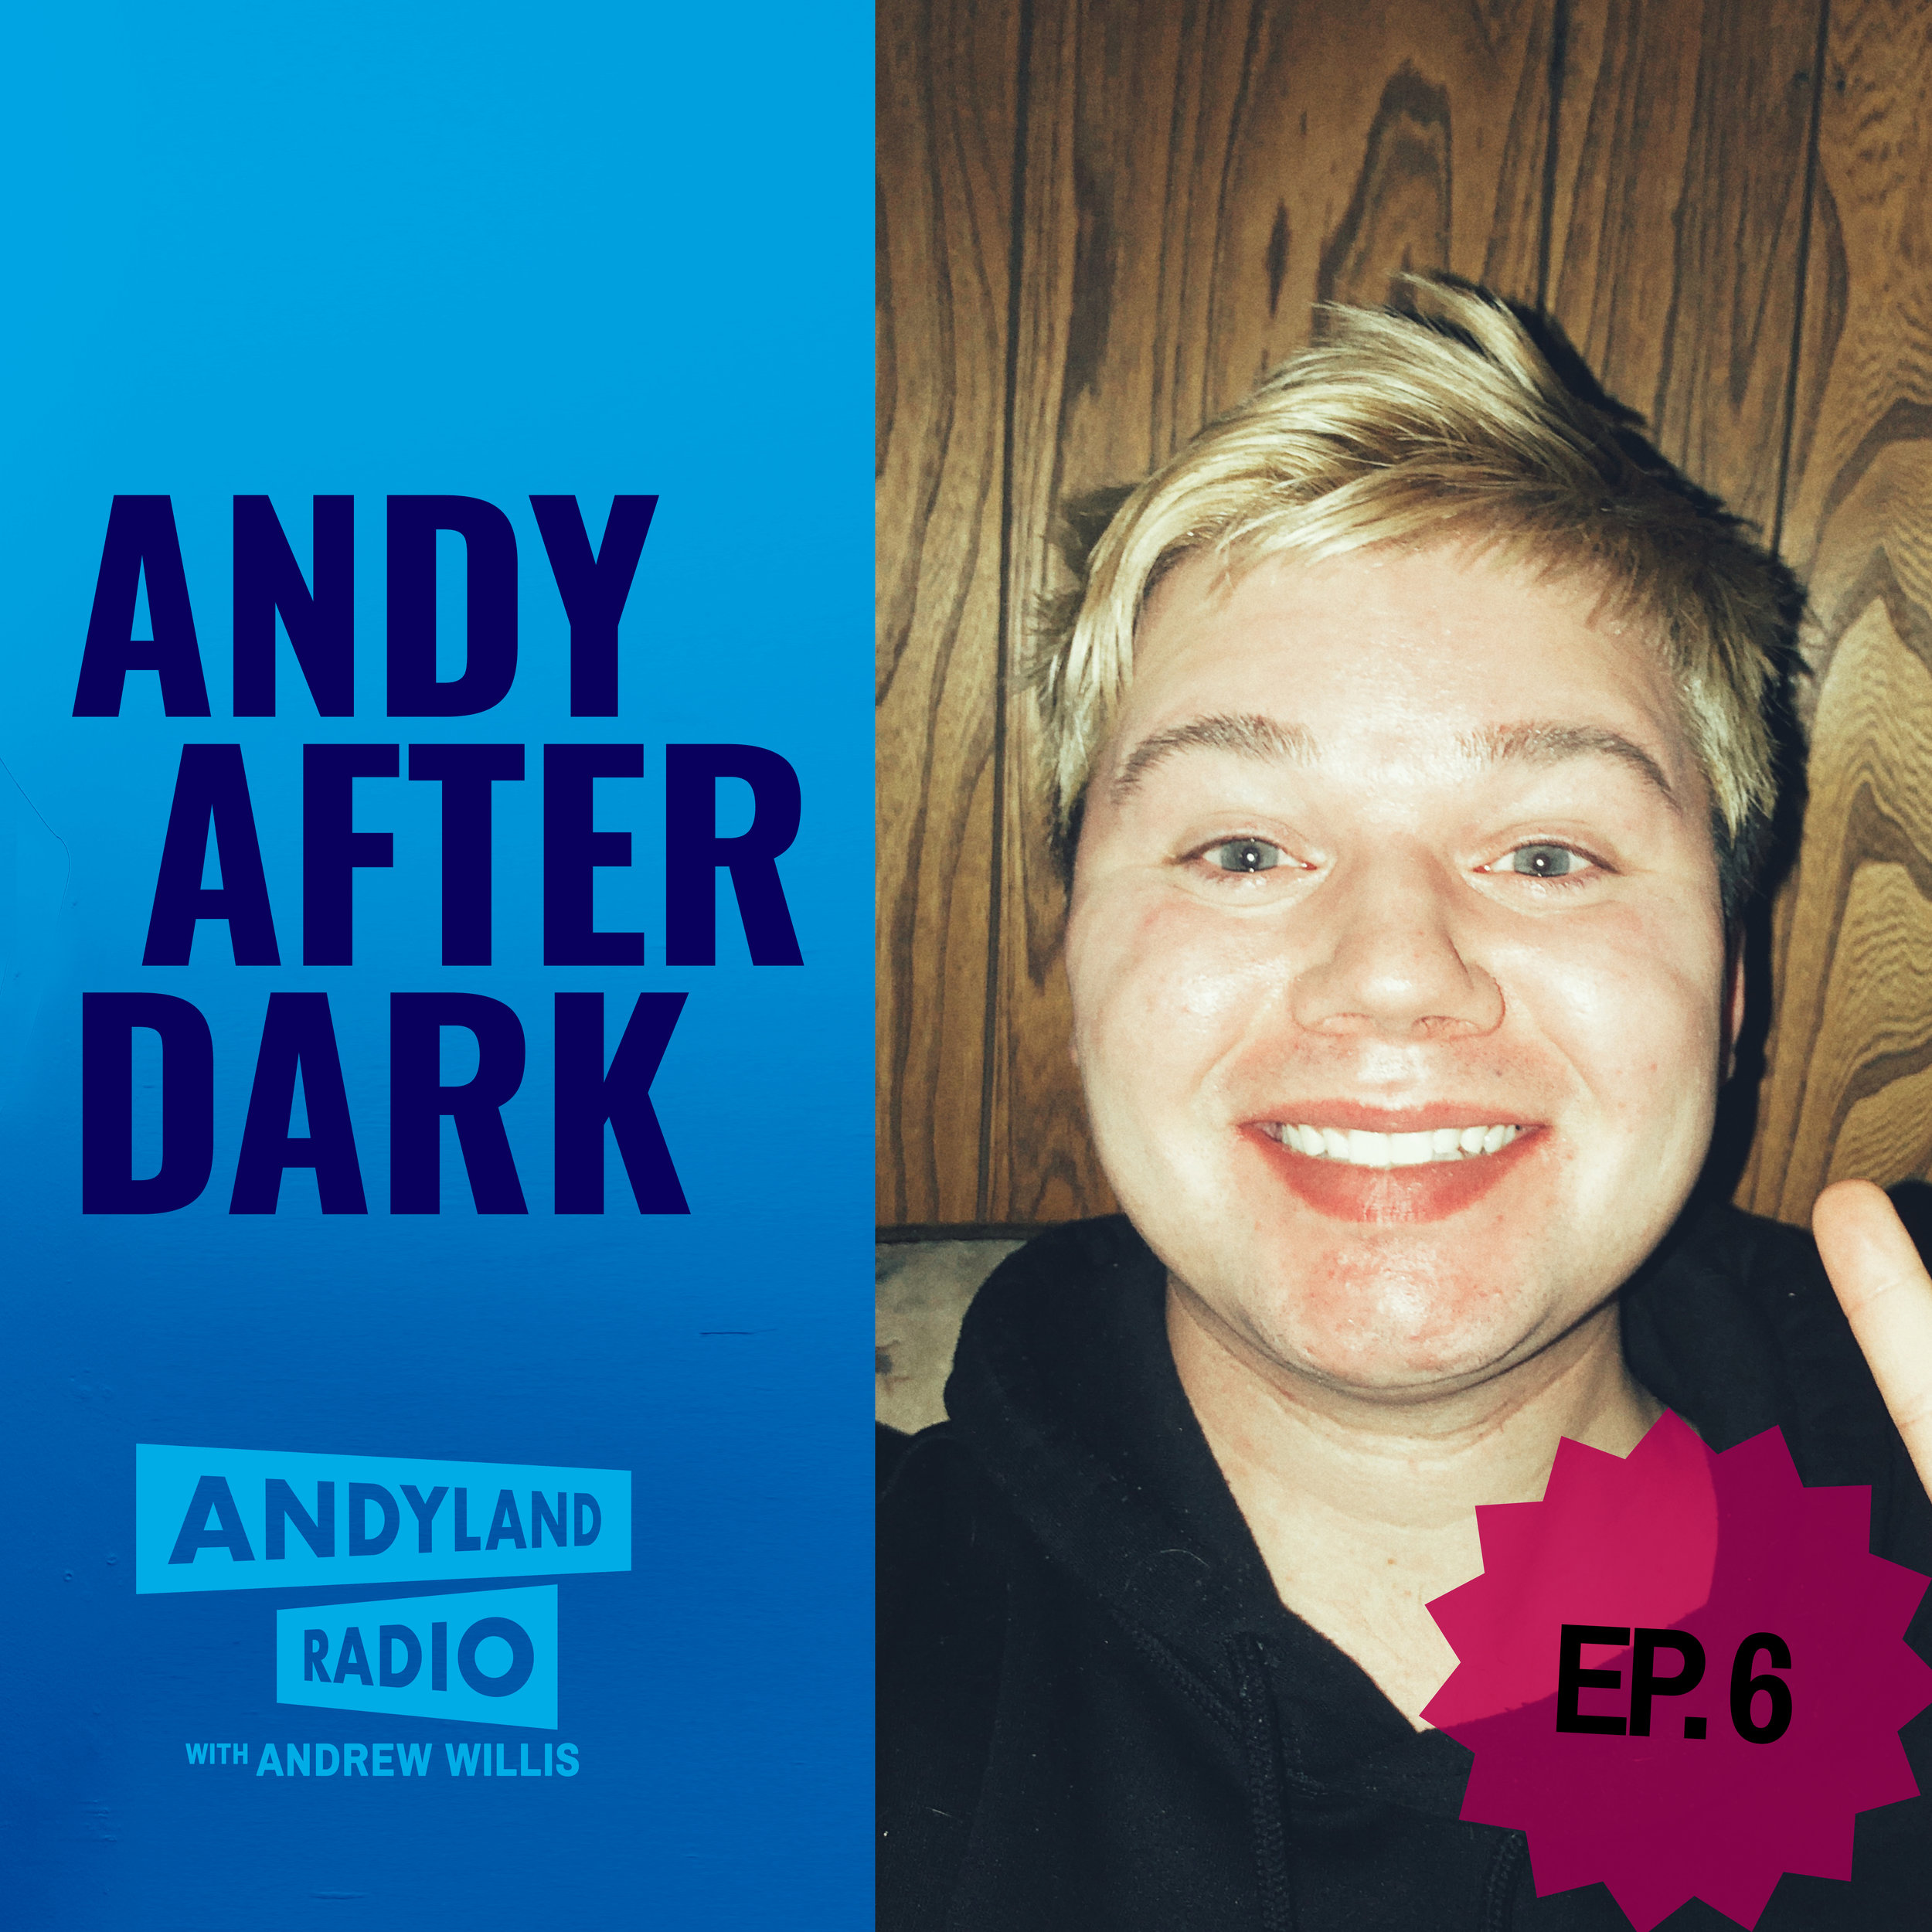 Andy After Dark Episode 6 Andyland Radio with Andrew Willis.jpg